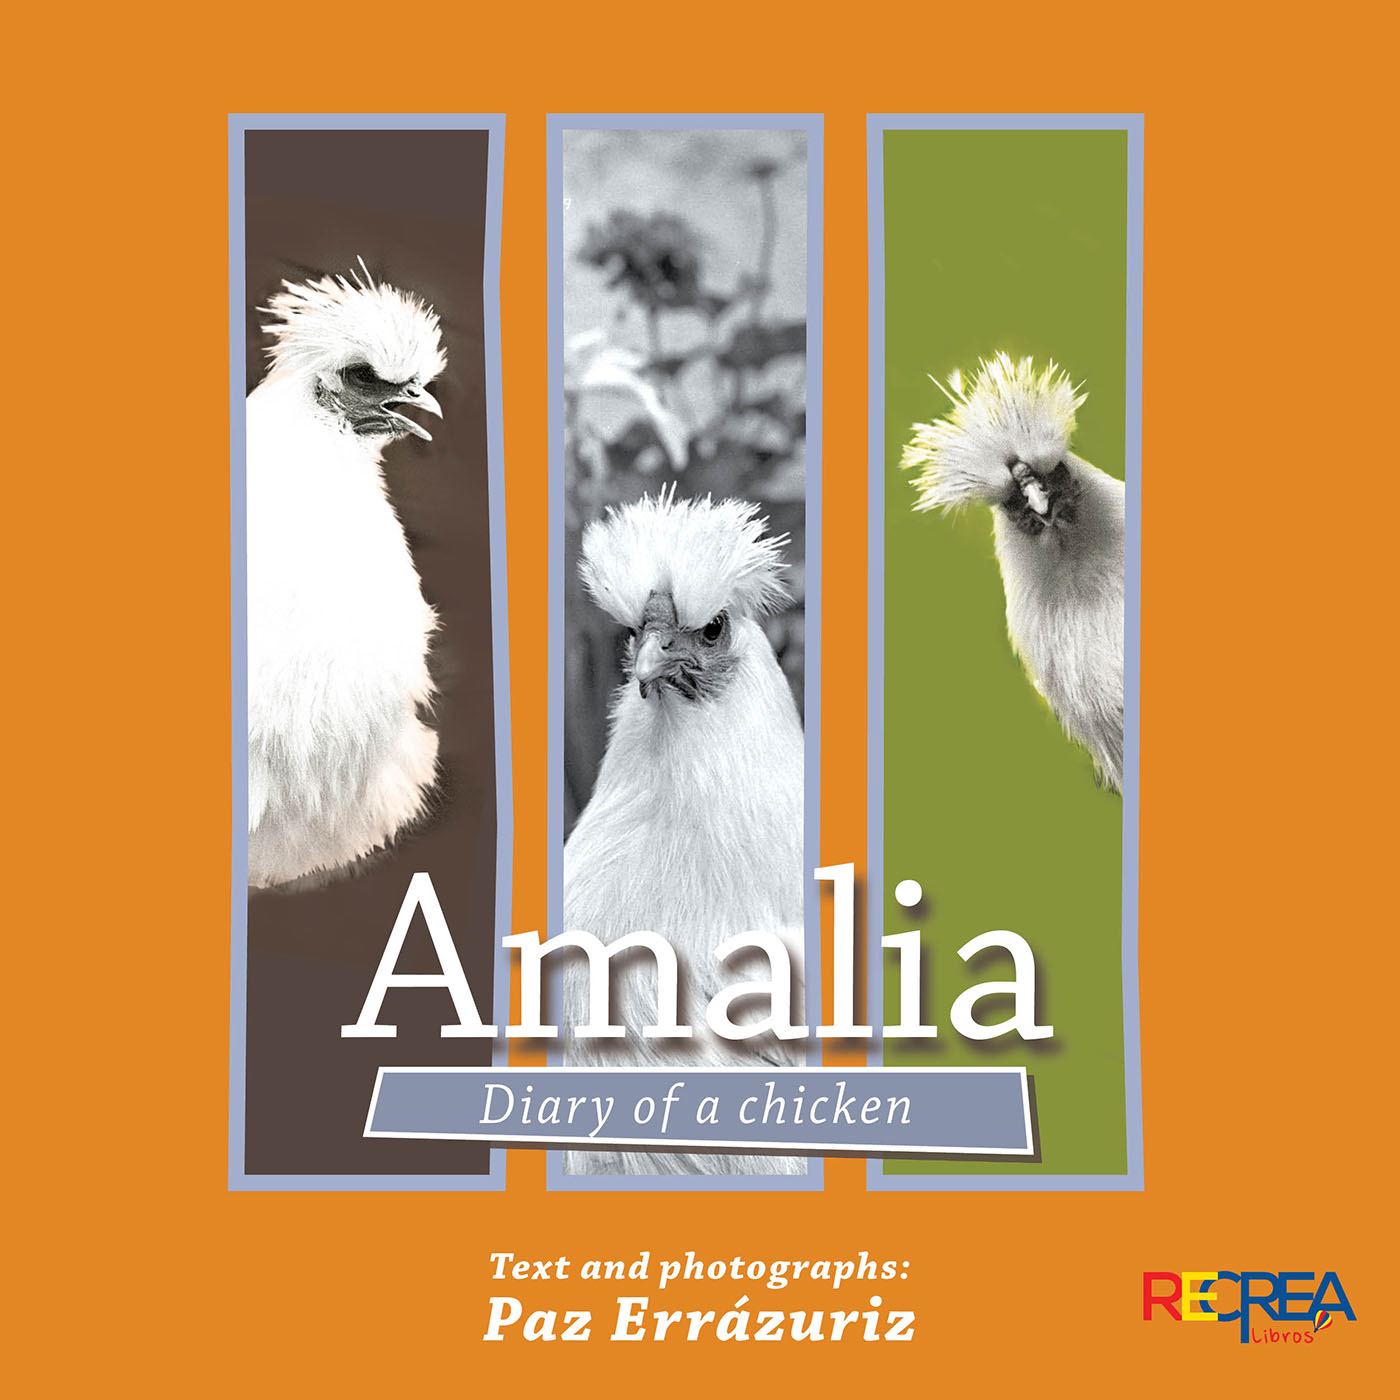 Amalia Diary of a chicken